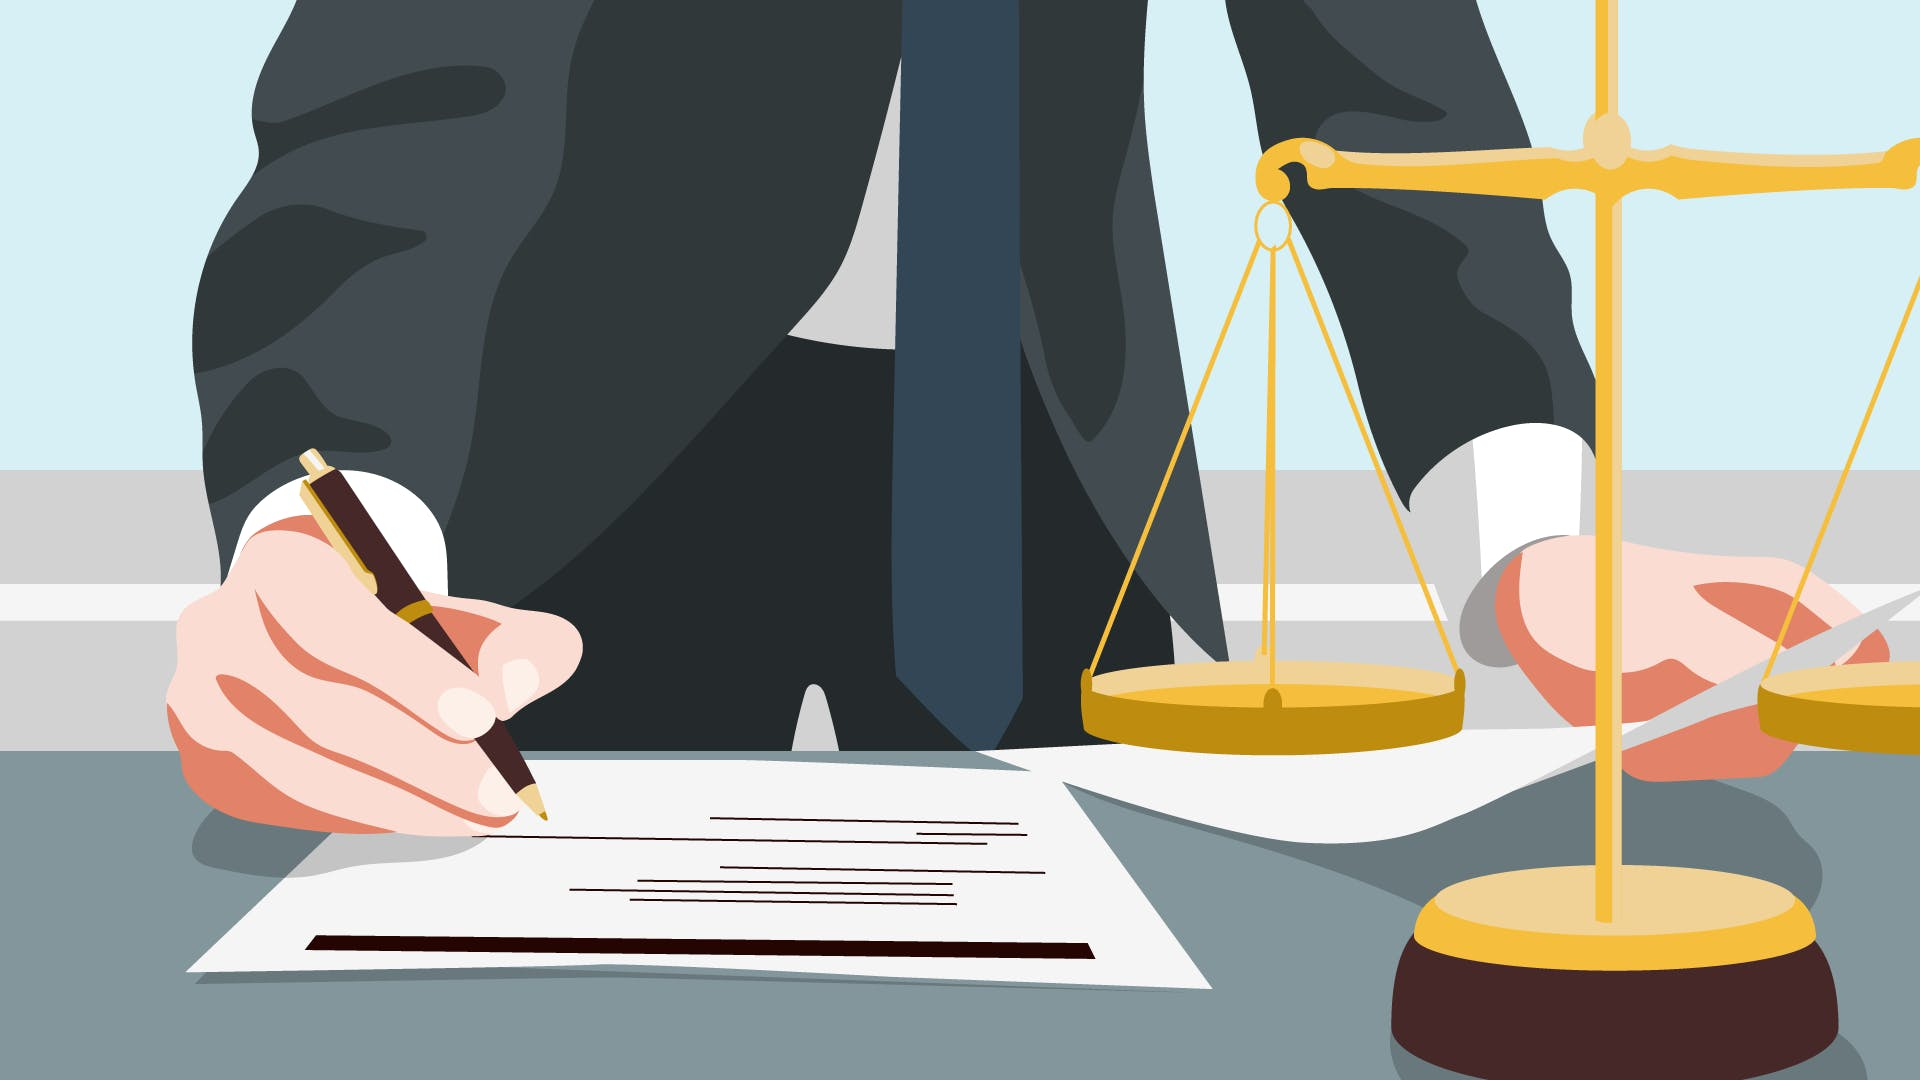 Gewerberechtsschutzversicherung